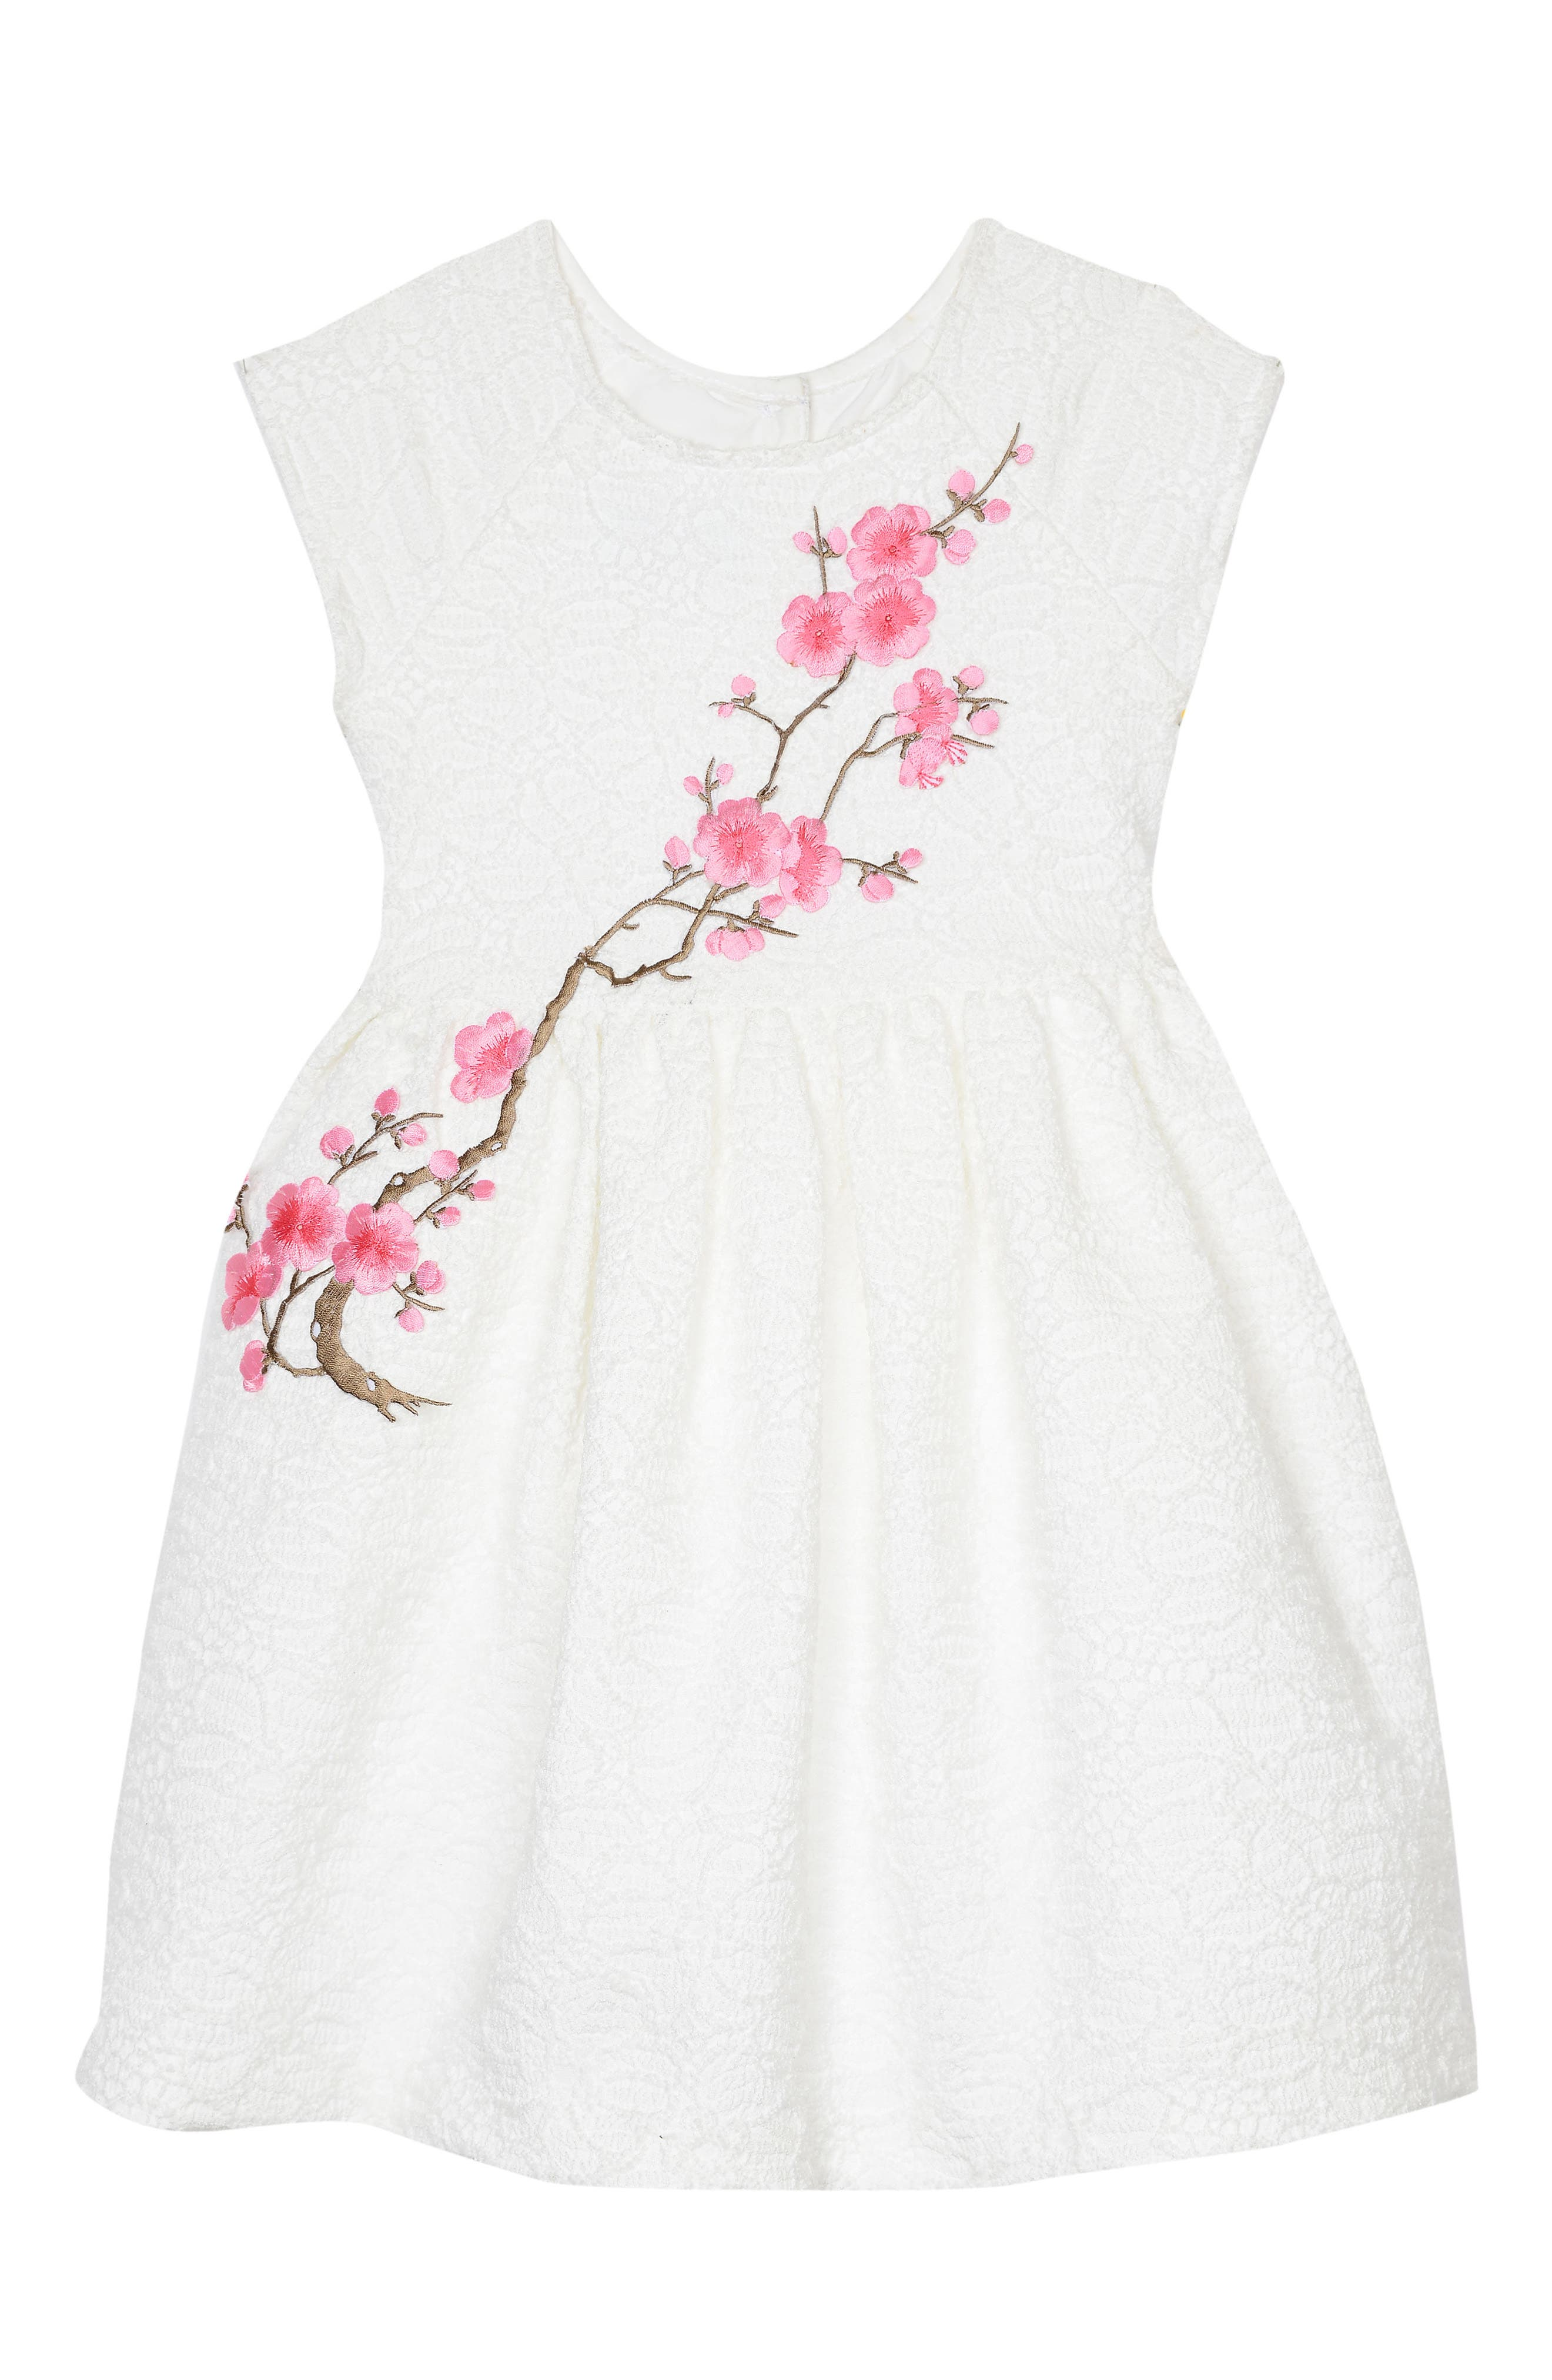 Pippa & Julie Cherry Blossom Dress (Baby Girls)